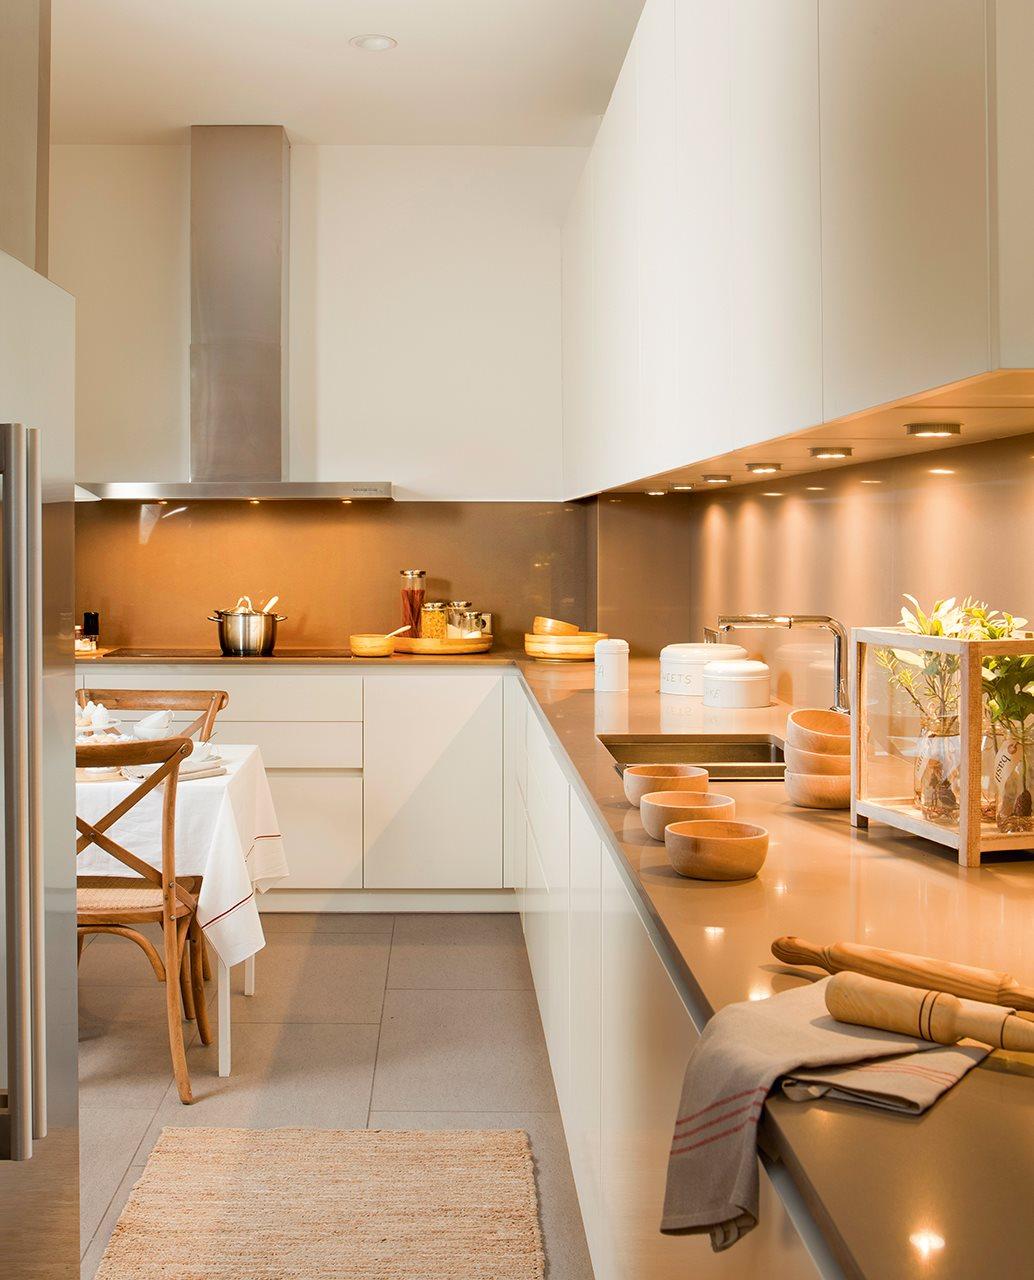 Qu luz le va a cada estancia acierta - Apliques de cocina ...